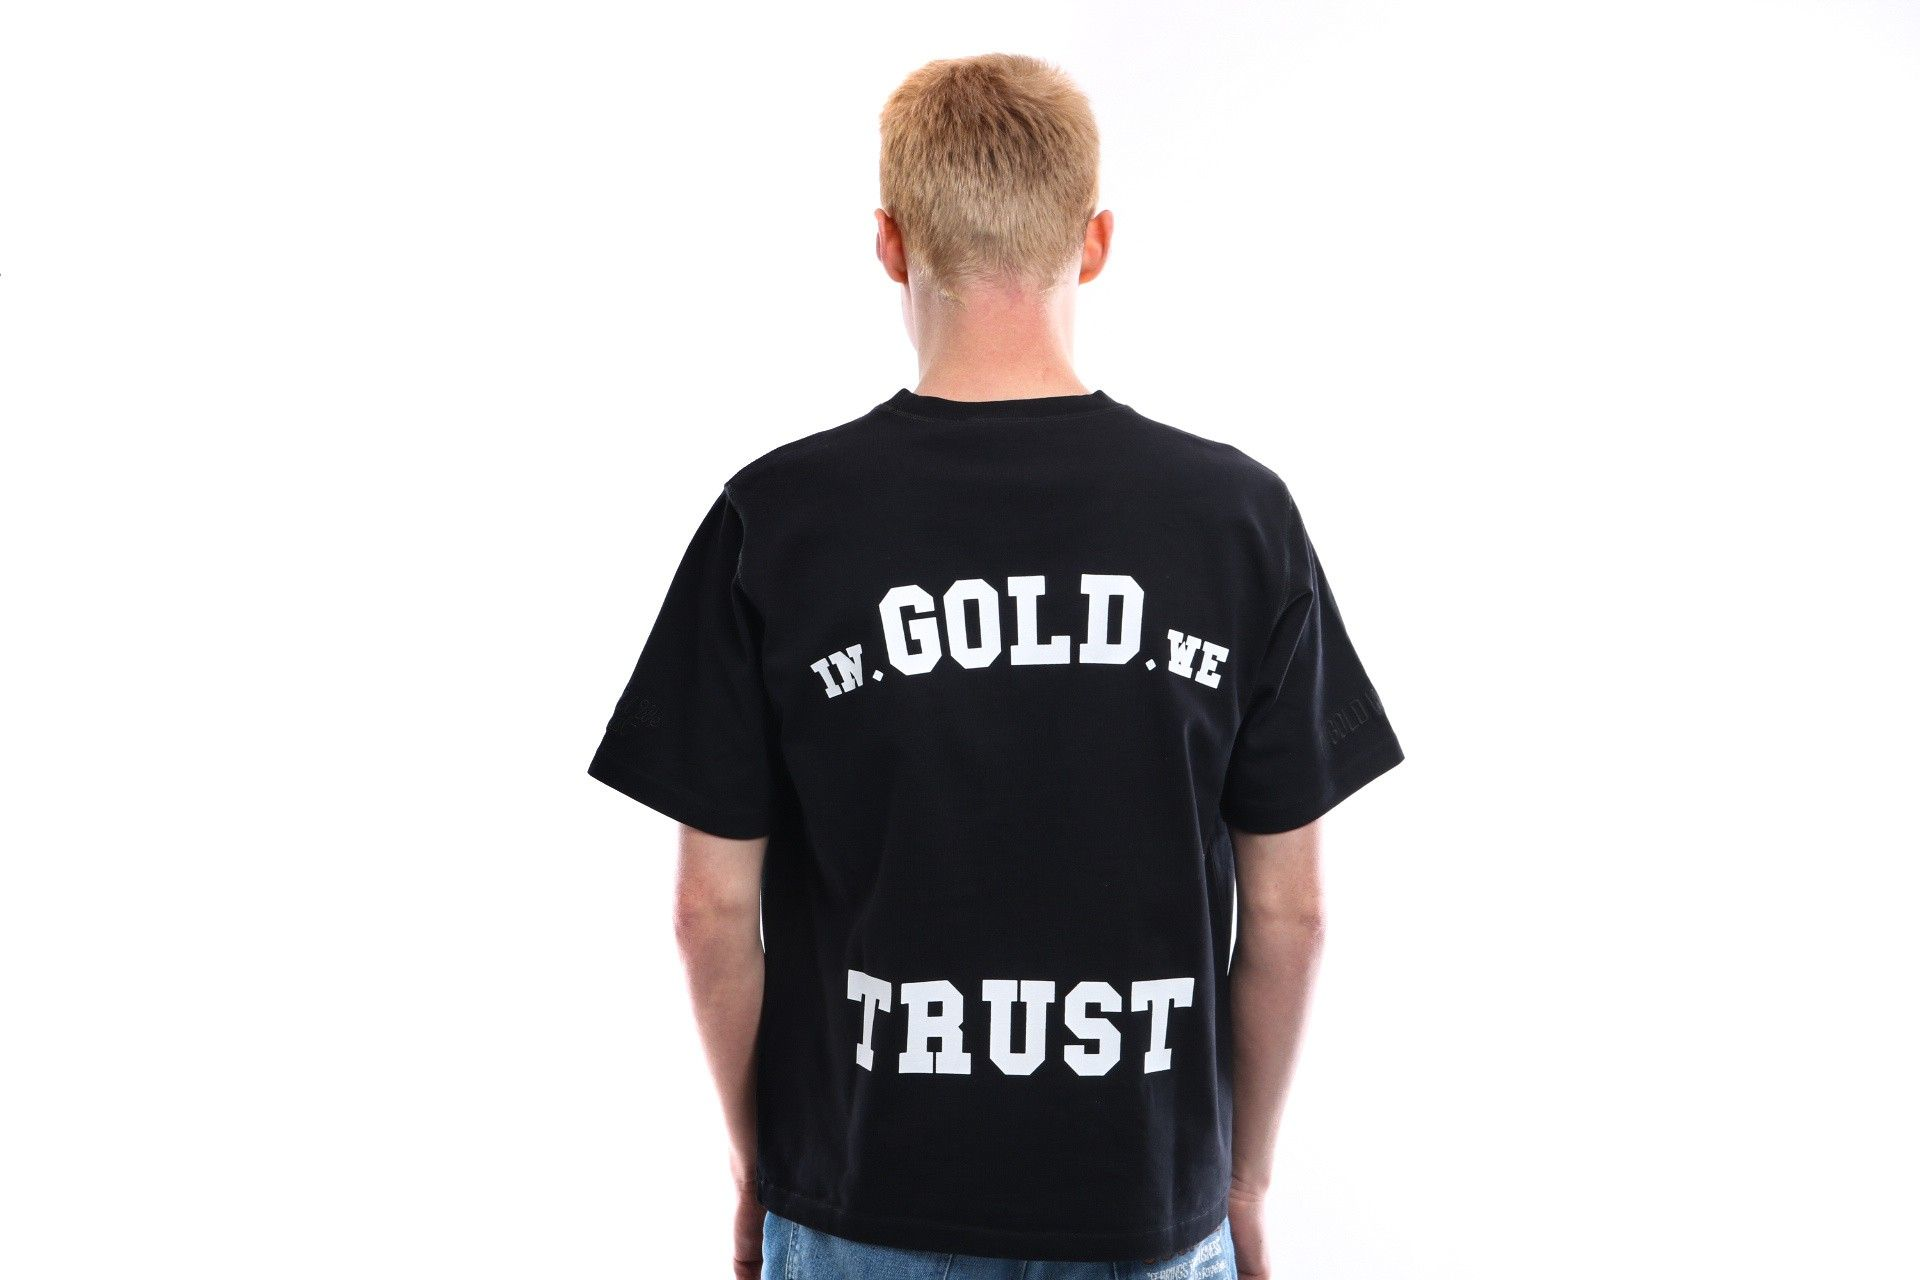 Afbeelding van In Gold We Trust T Shirt Overside Tee Basic Print Black Print Frond Black / White IGWT-003